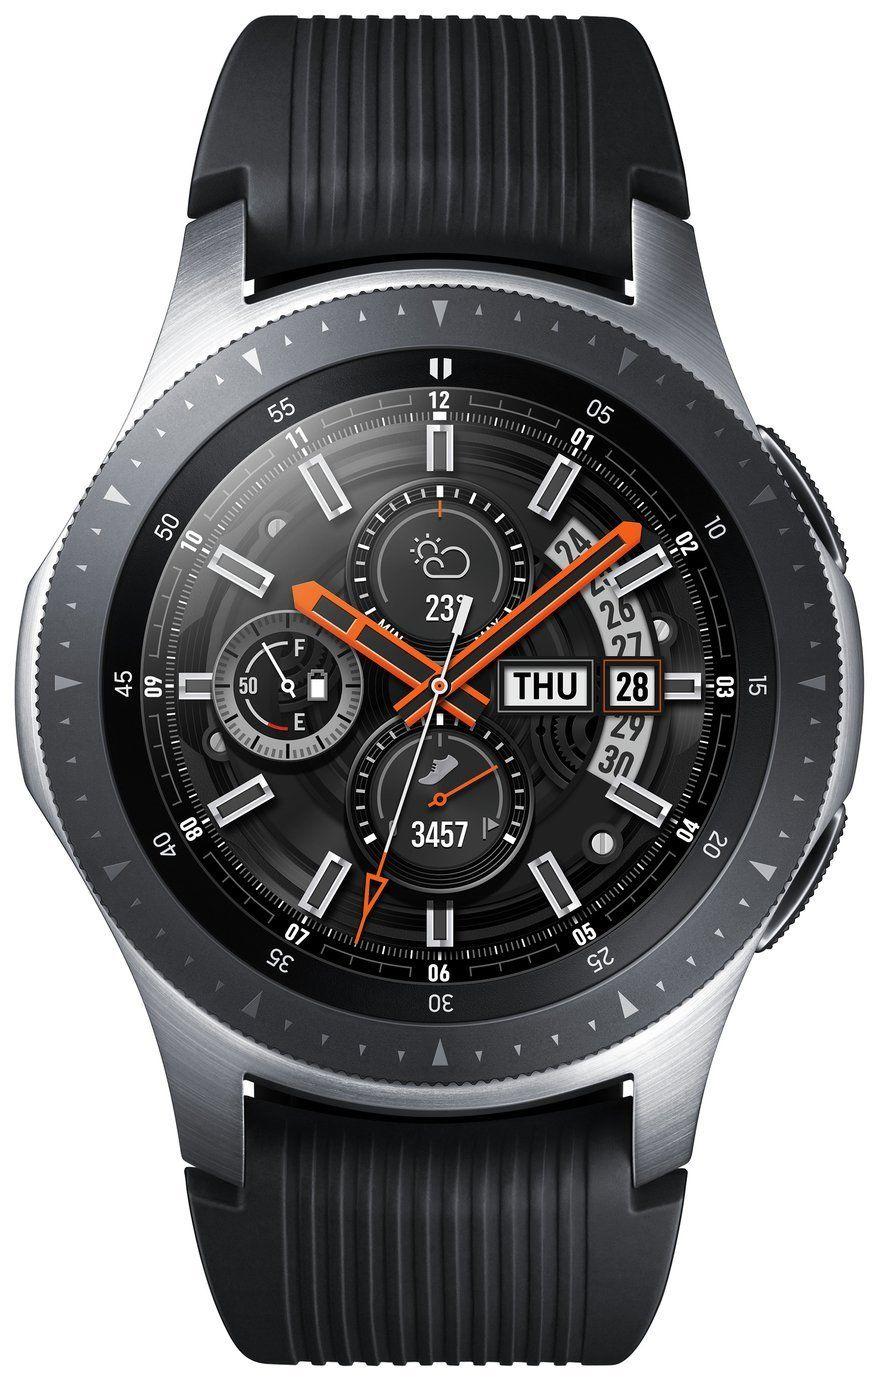 Samsung Galaxy Watch 46mm Bluetooth Smart Watch Refurbished - £195.49 with code @ Argos Ebay